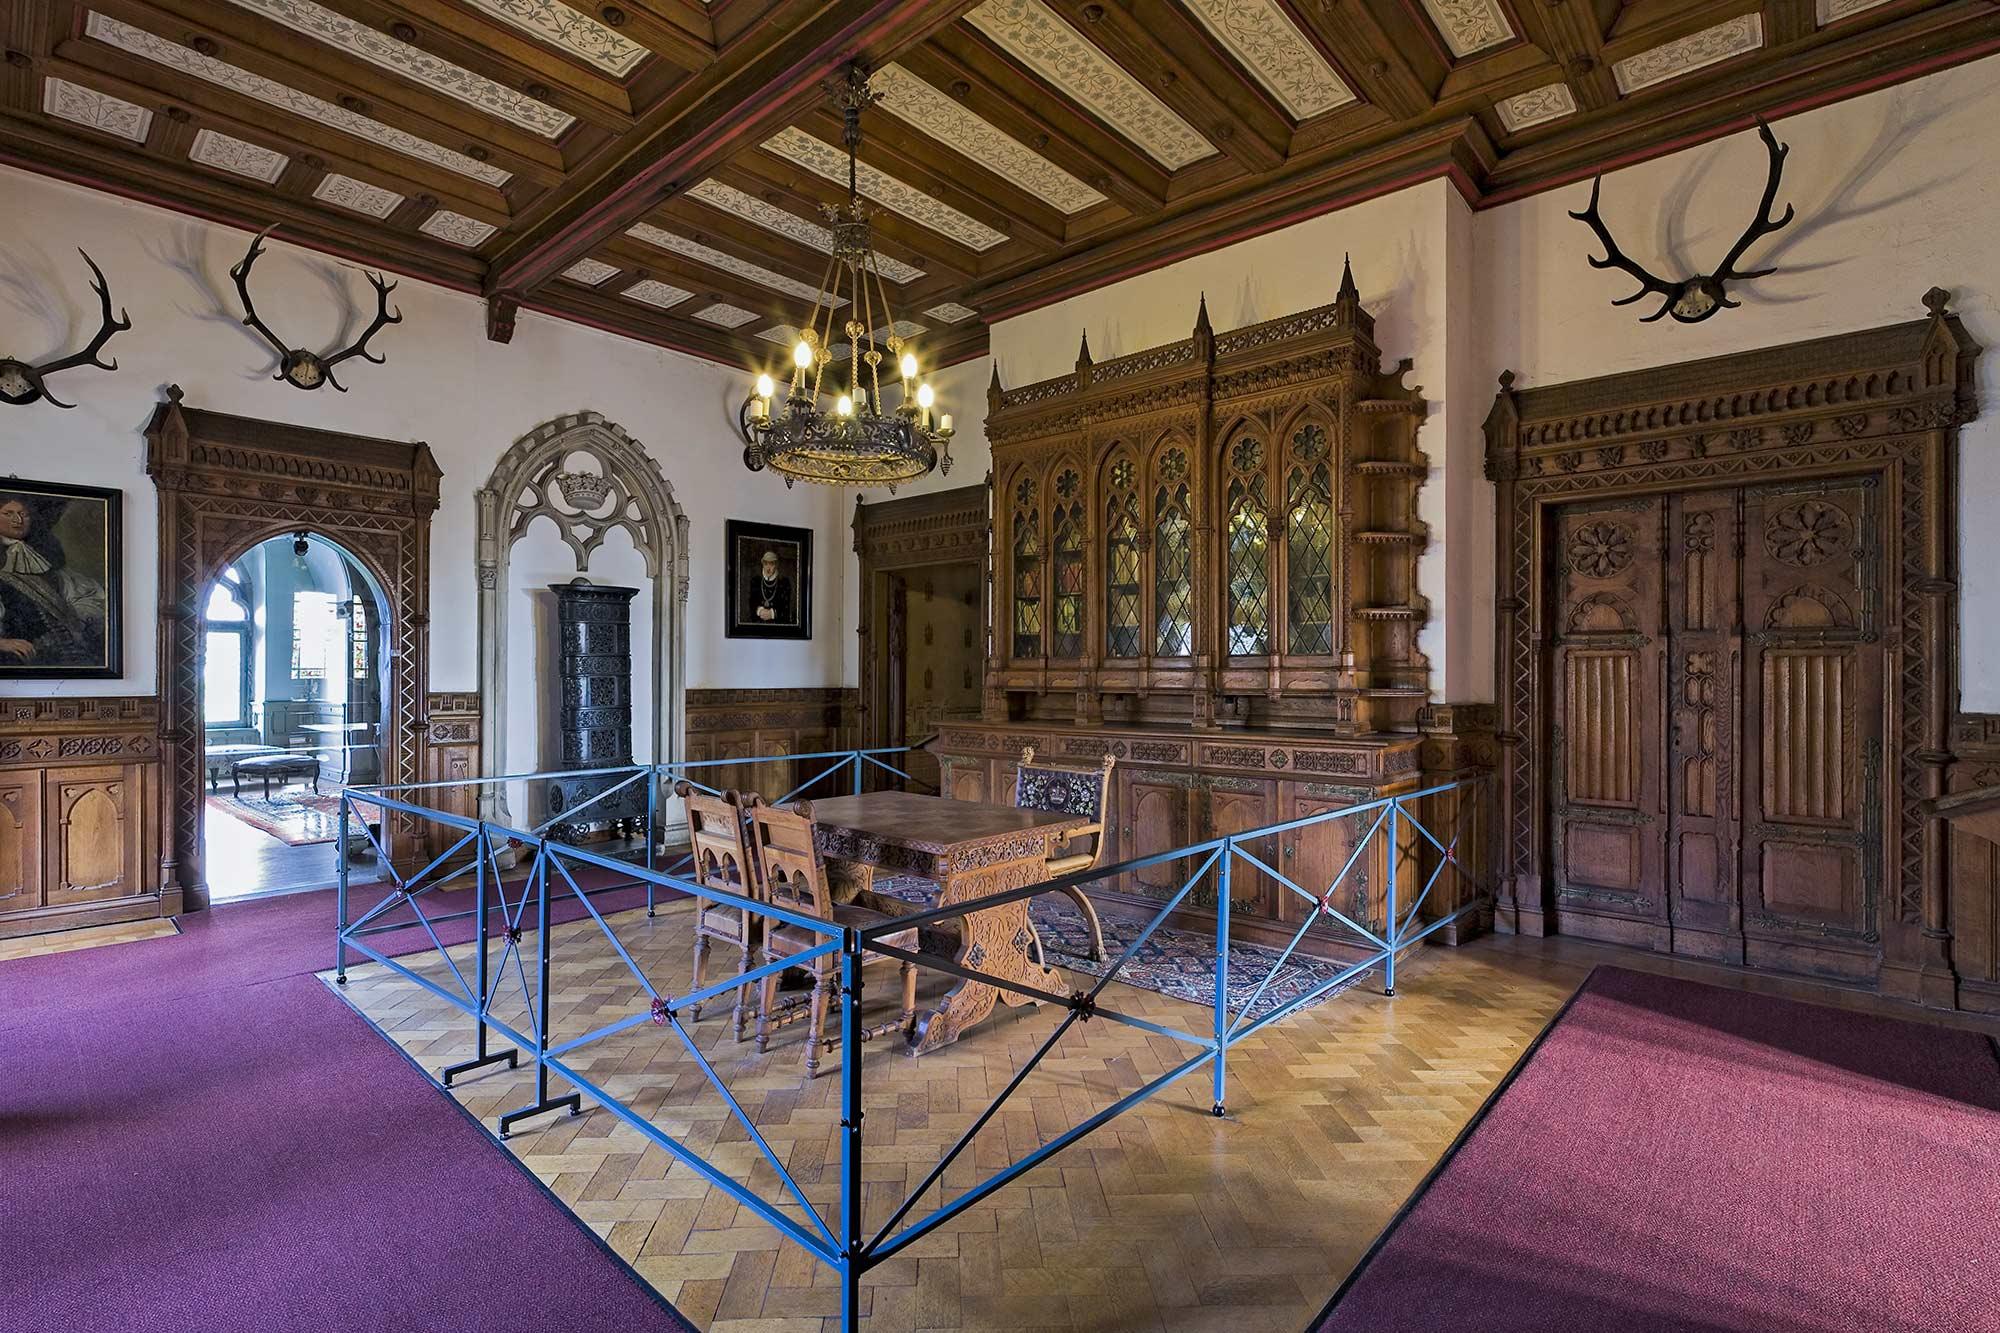 The Library at Bentheim Castle © burgbentheim.de